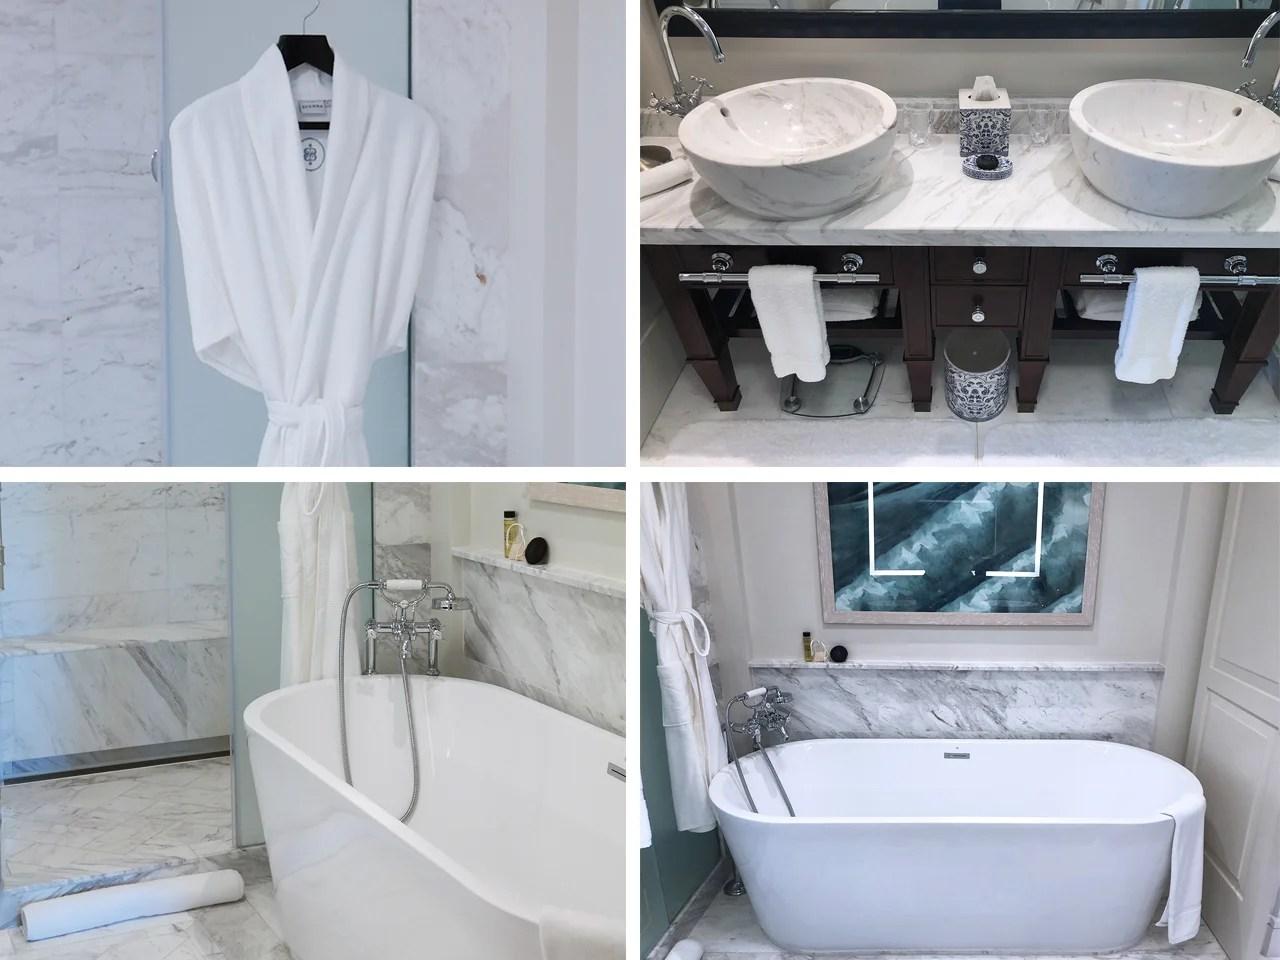 Rosewood Baha Mar: A Review of Baha Mar's Luxury Resort